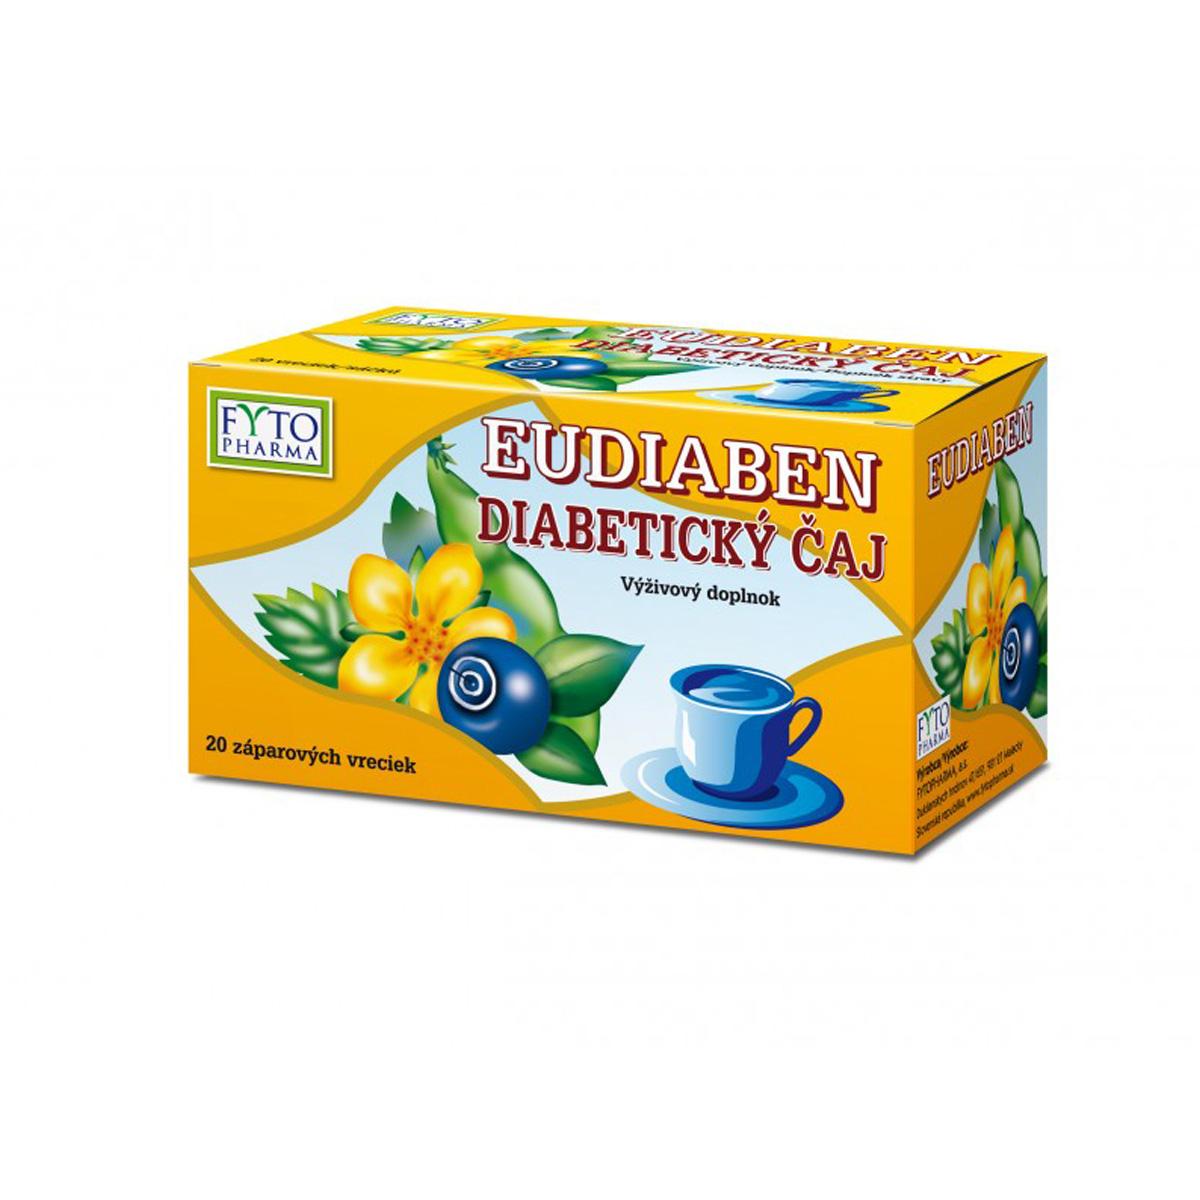 Fytopharma Diabetický čaj EUDIABEN® 20 x 1 g